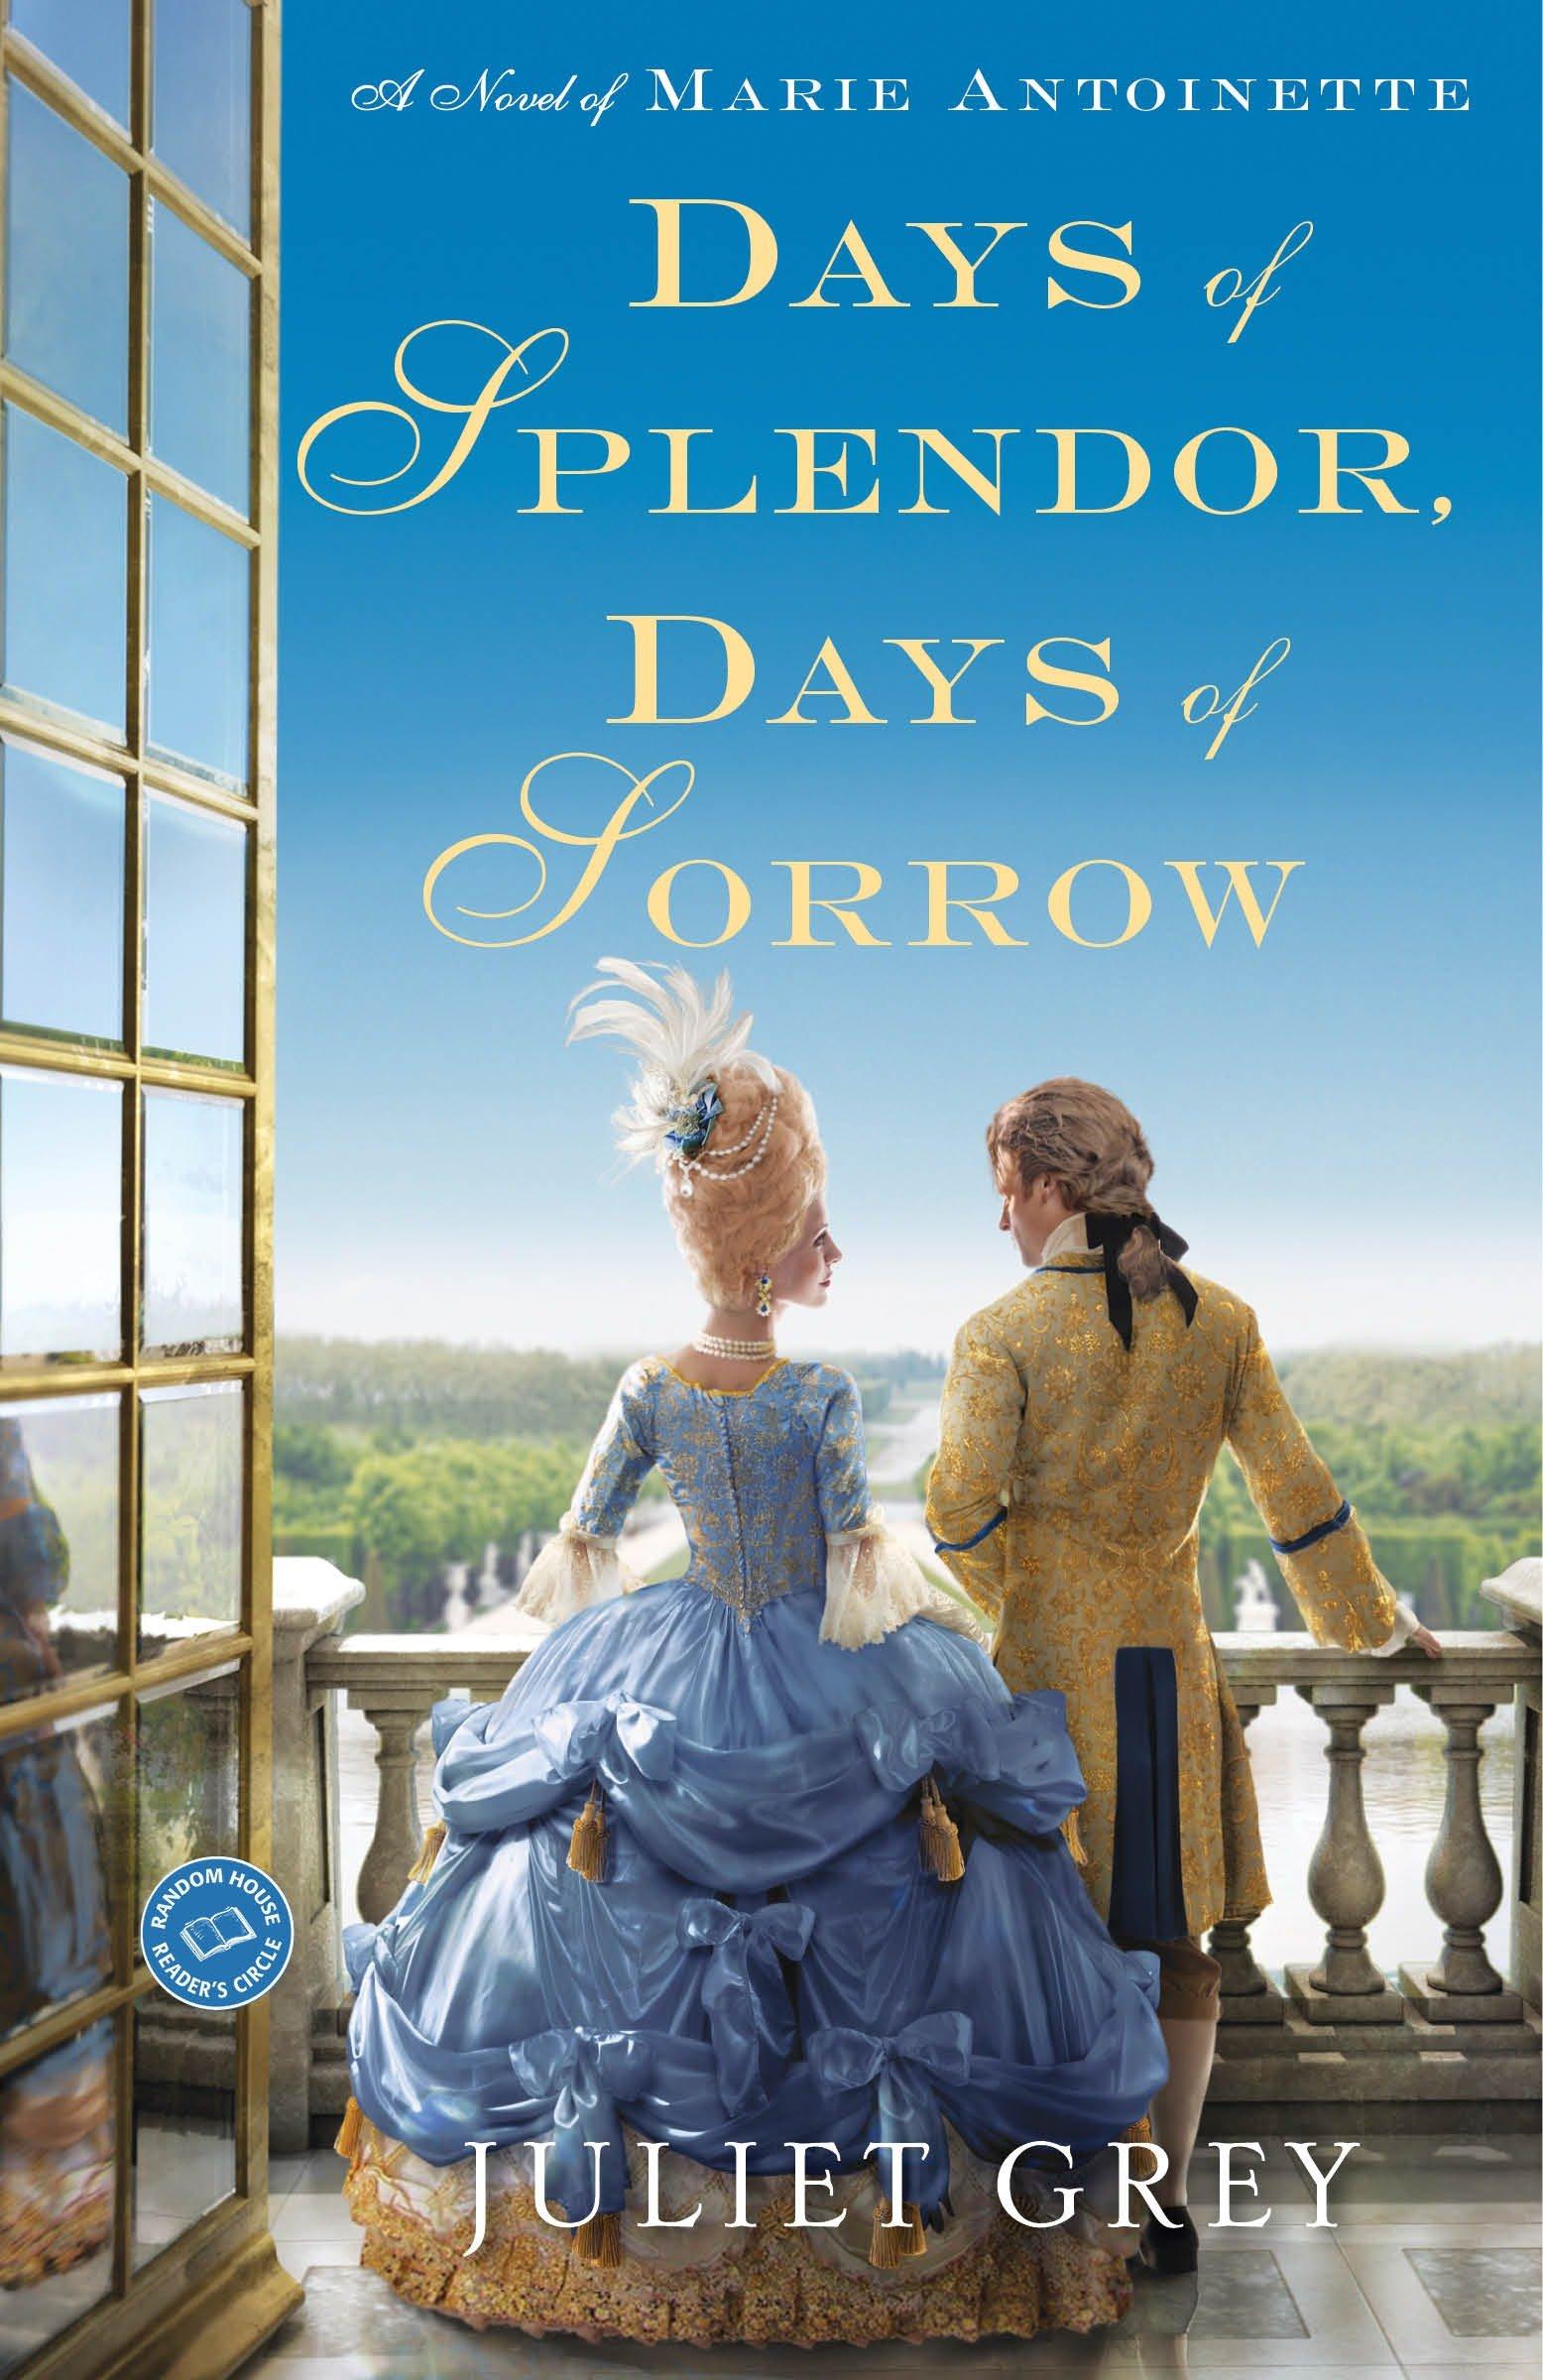 Days of splendor, days of sorrow cover image